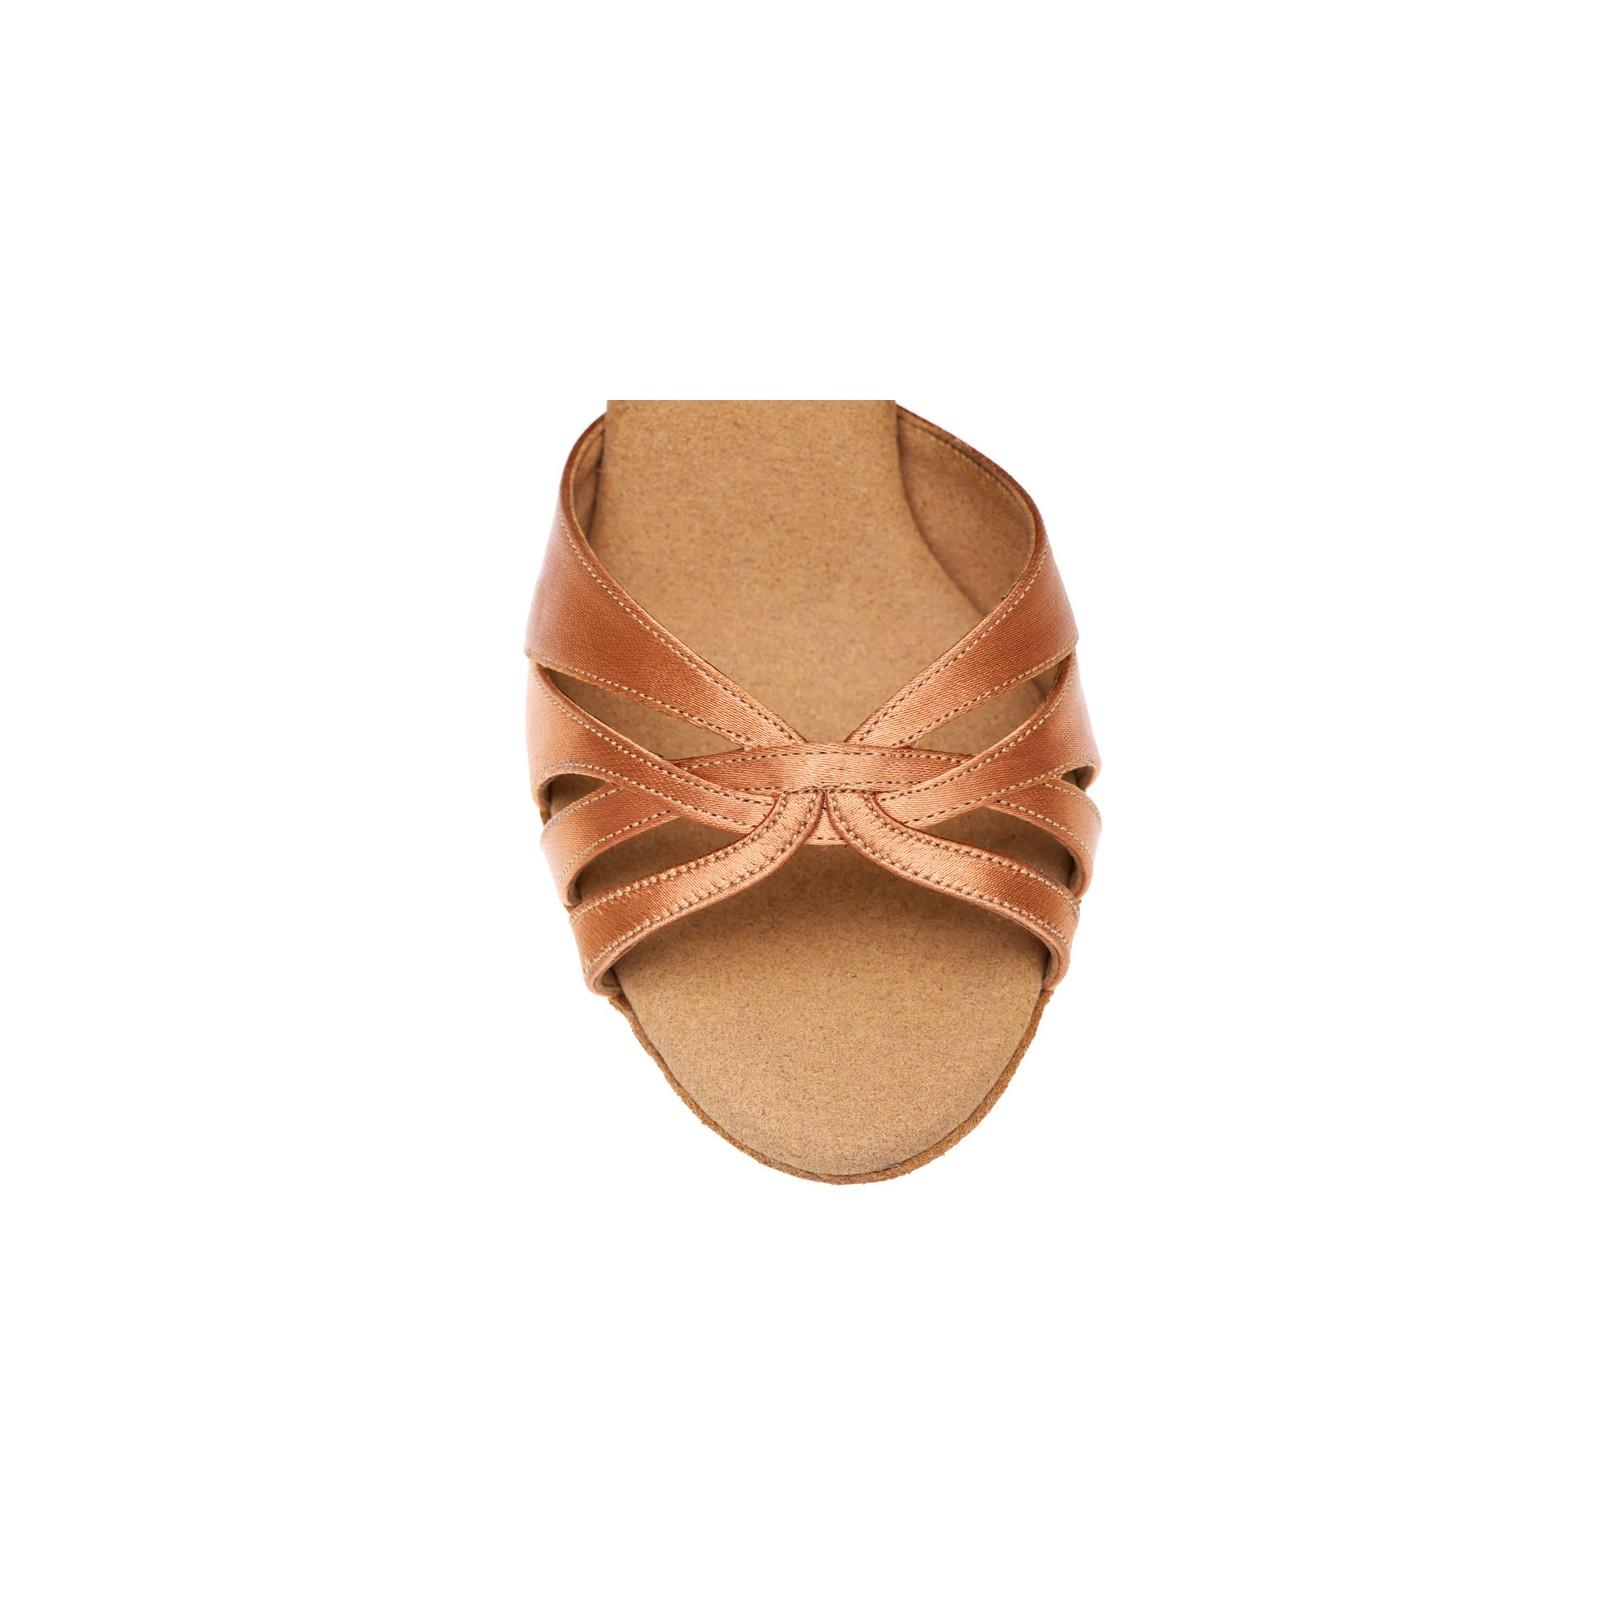 Chaussures de danse Rummos Lana satin tan foncé pointure